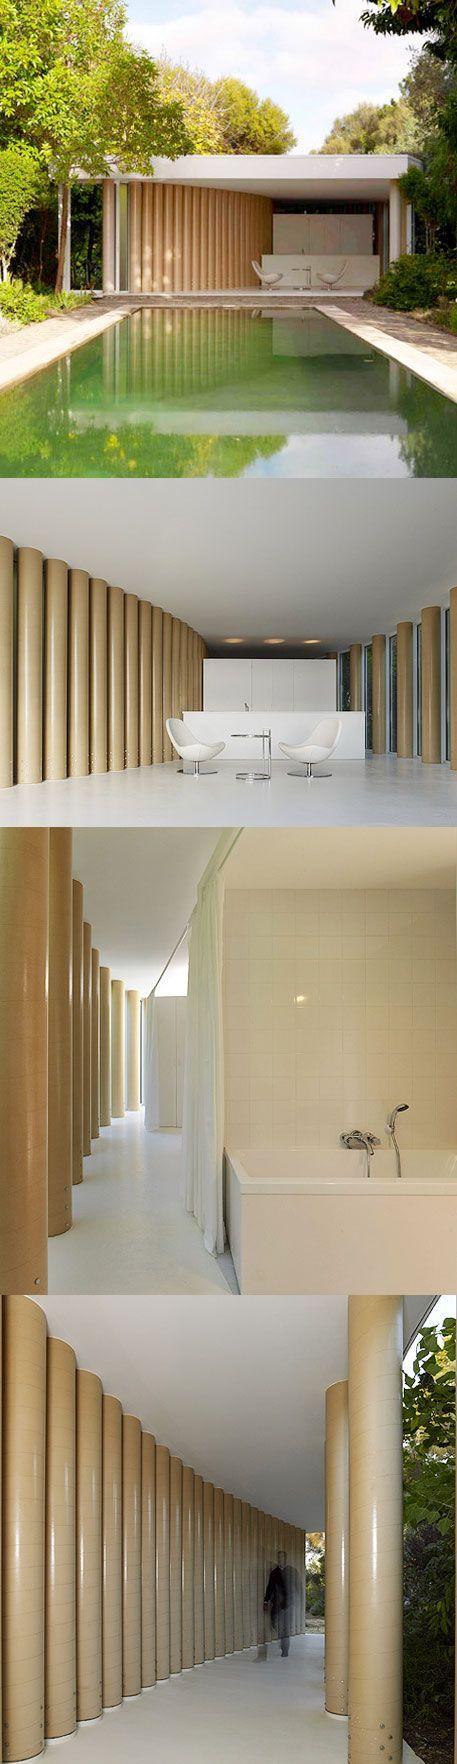 Shigeru Ban  #architecture #shigeruban Pinned by www.modlar.com